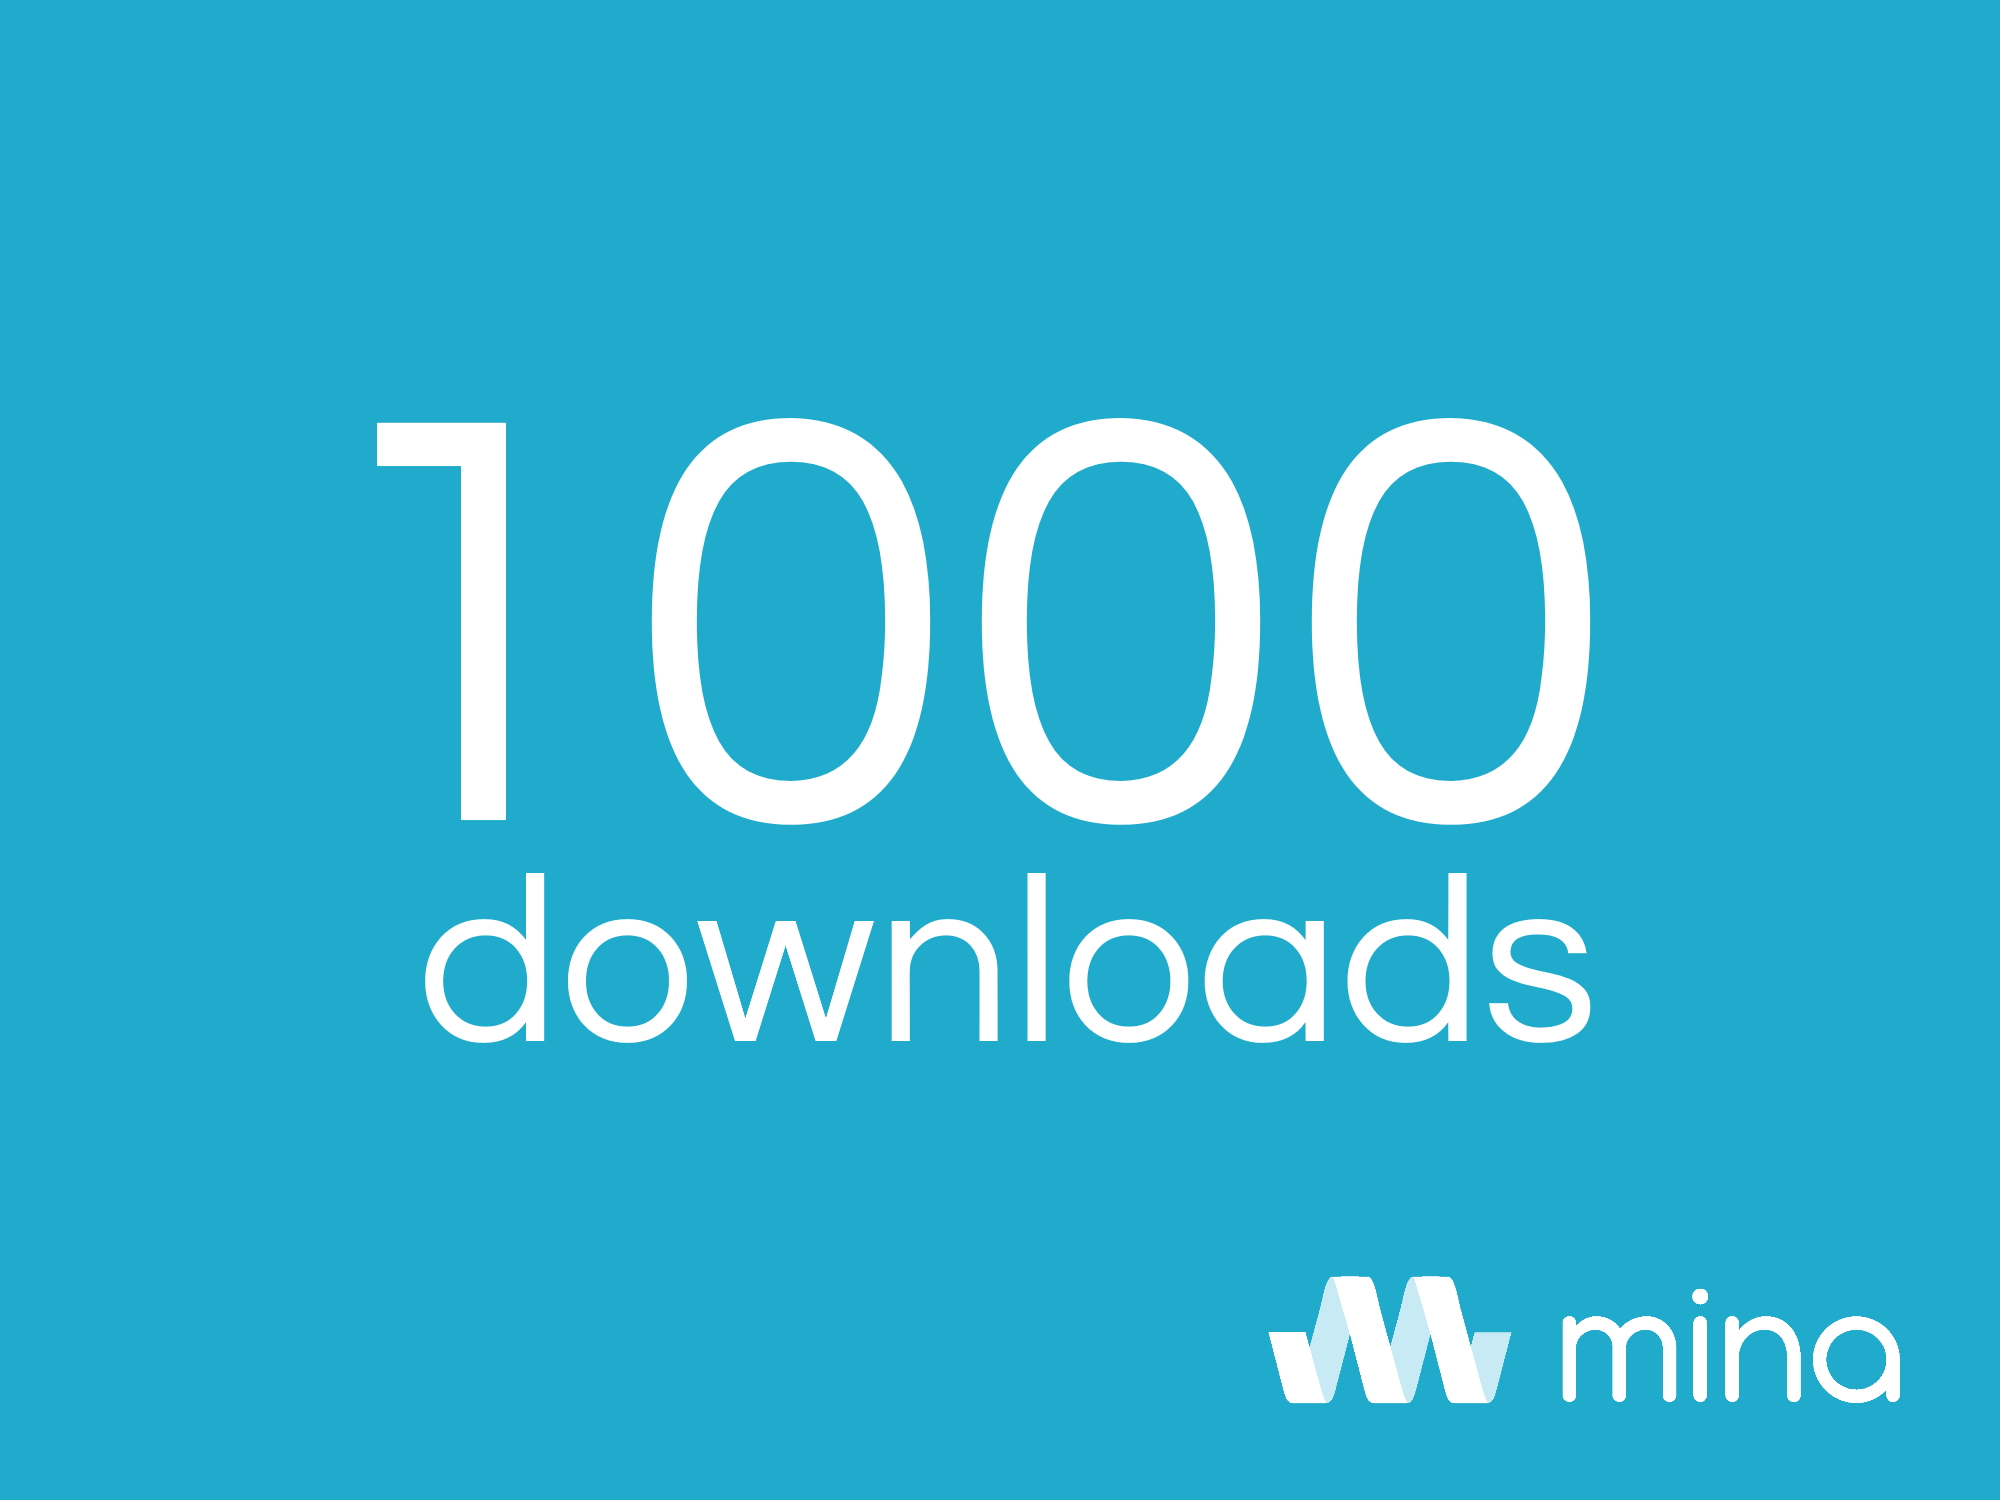 mina breaks the 1000 downloads mark